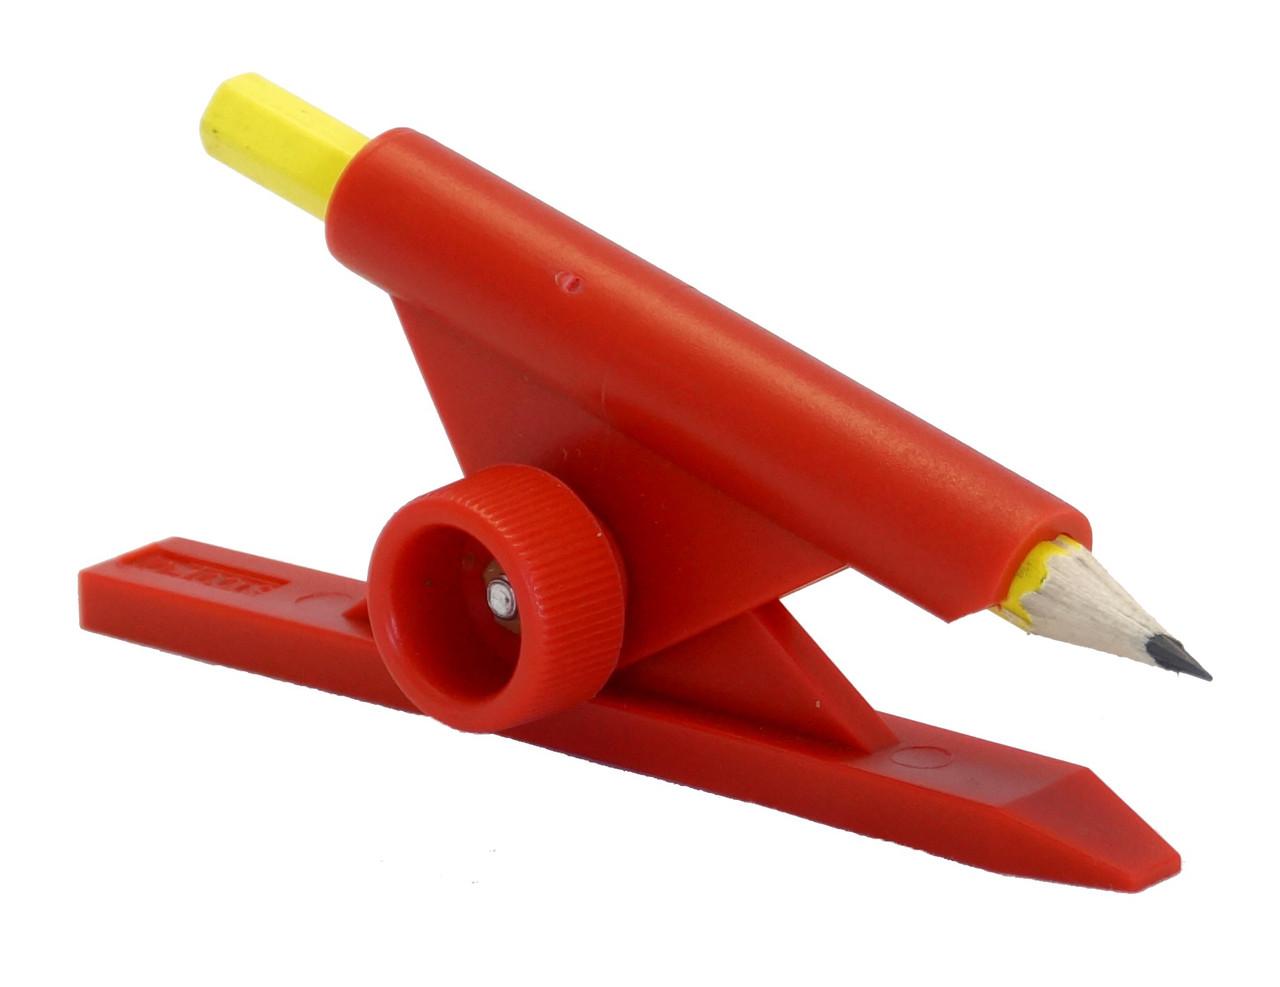 SPWE0123R - Parallel Scribing Tool  by Hoffmann-USA.com